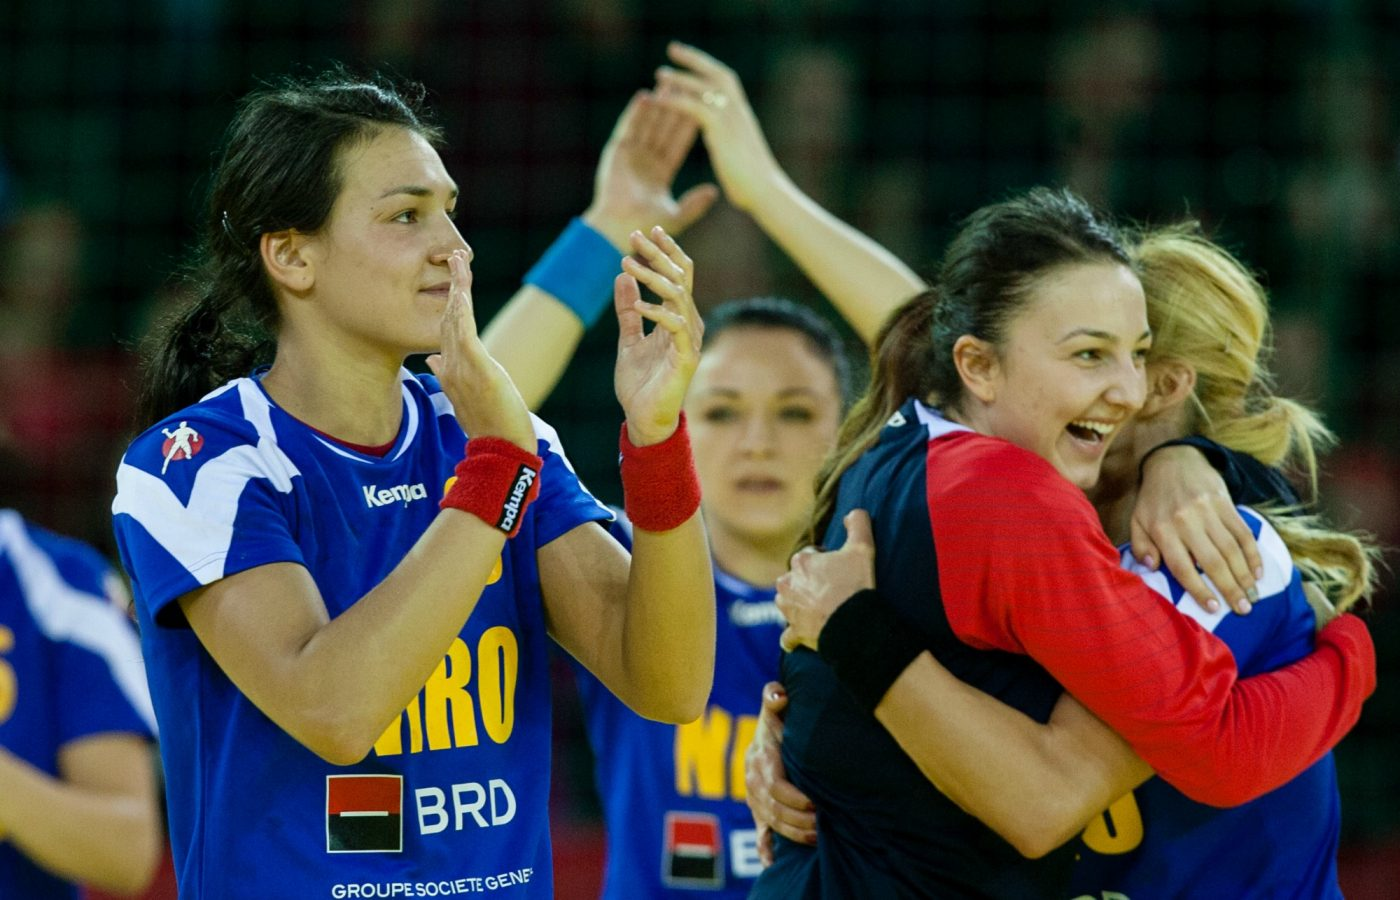 FOTO: Mircea Rosca / www.ActionFoto.ro